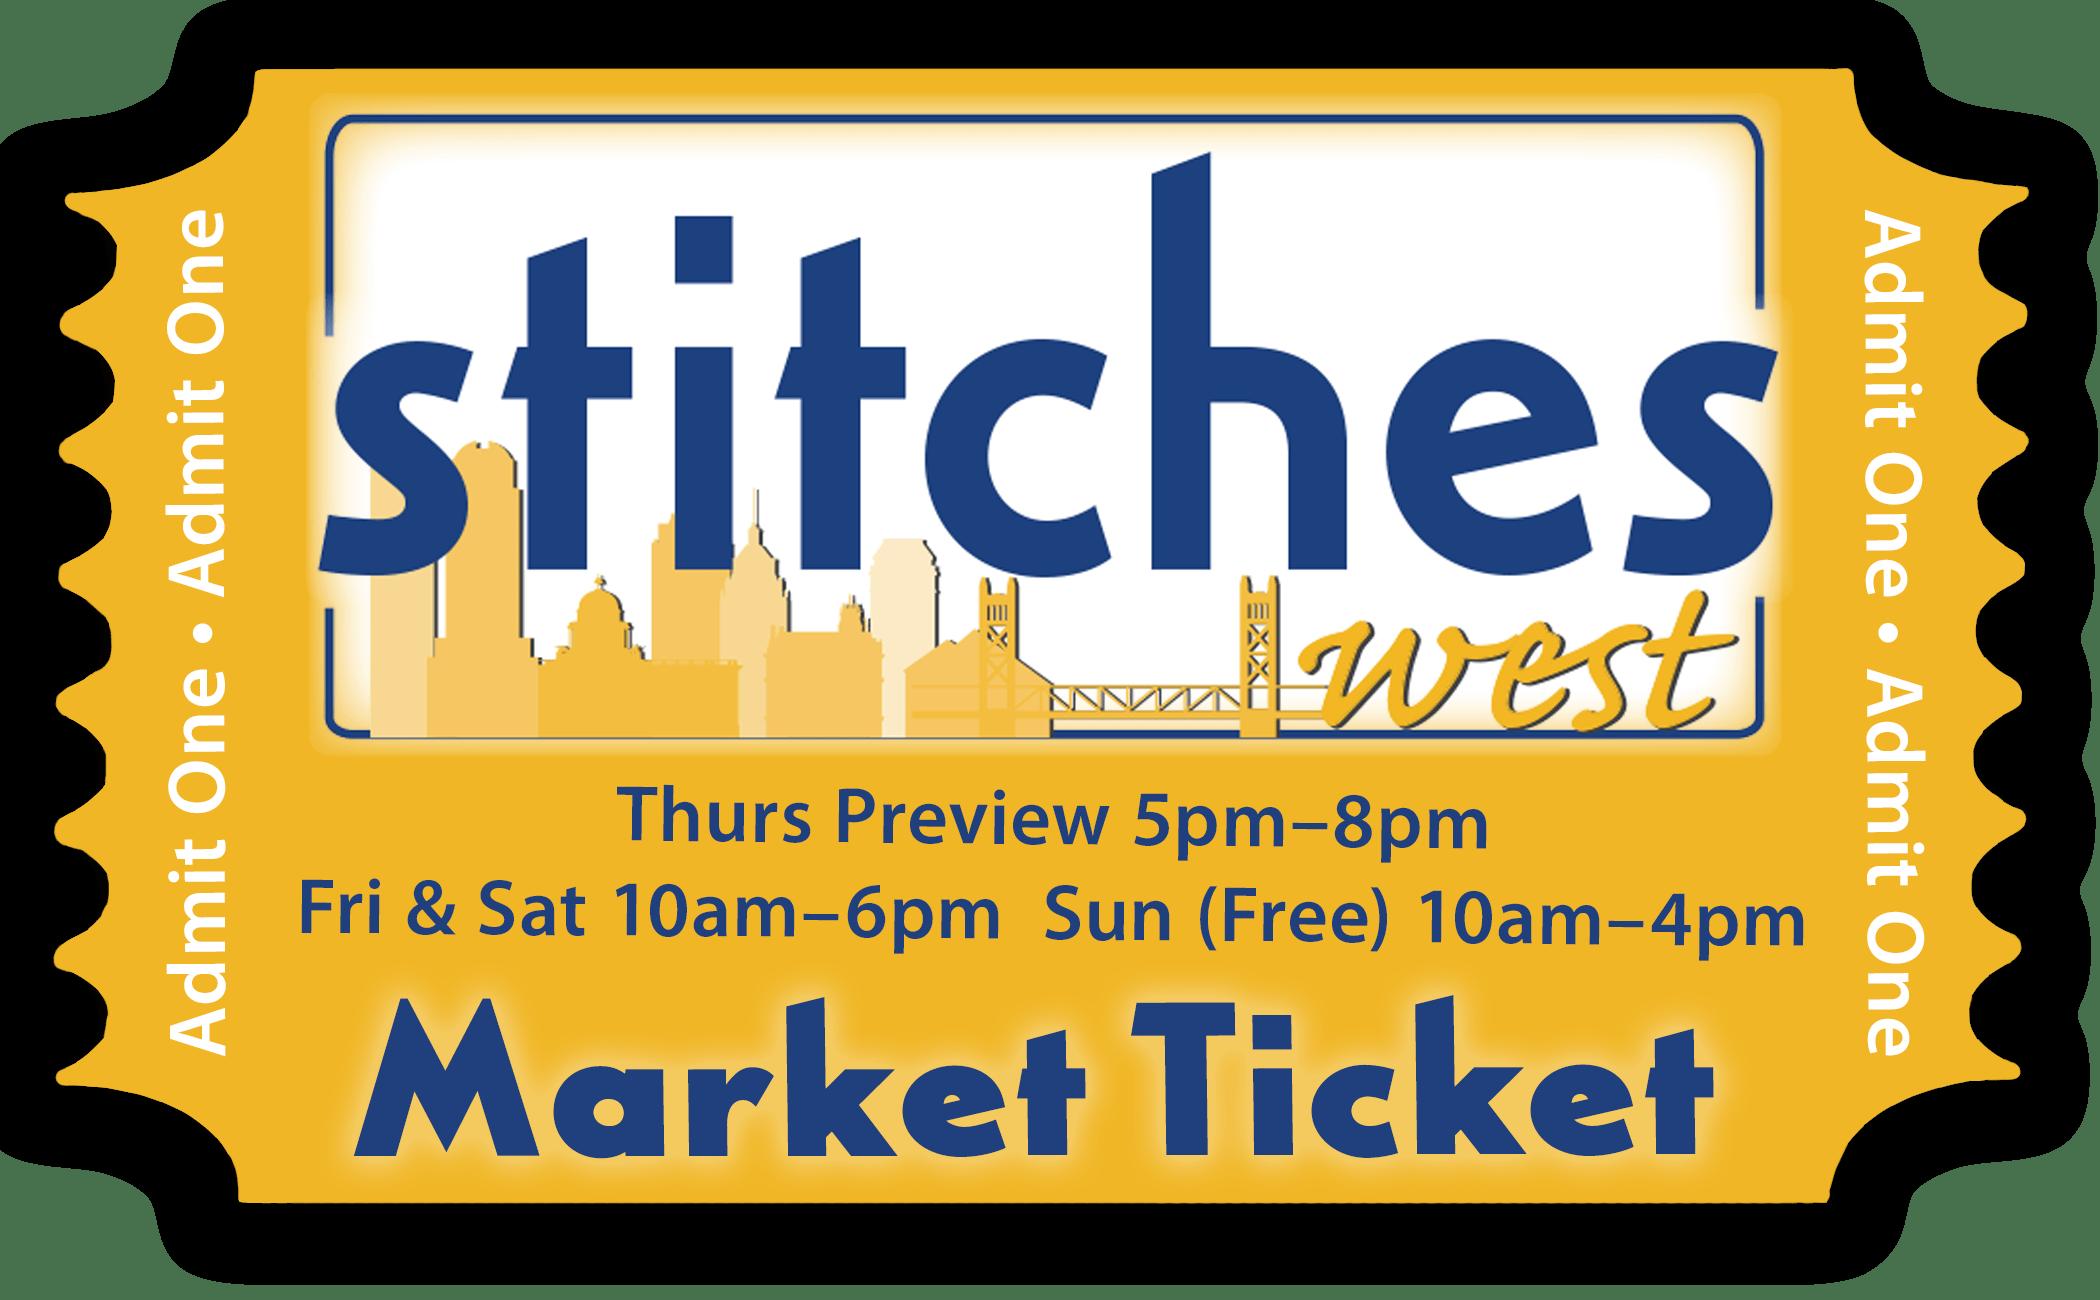 Stitches west Market Ticket with market hours